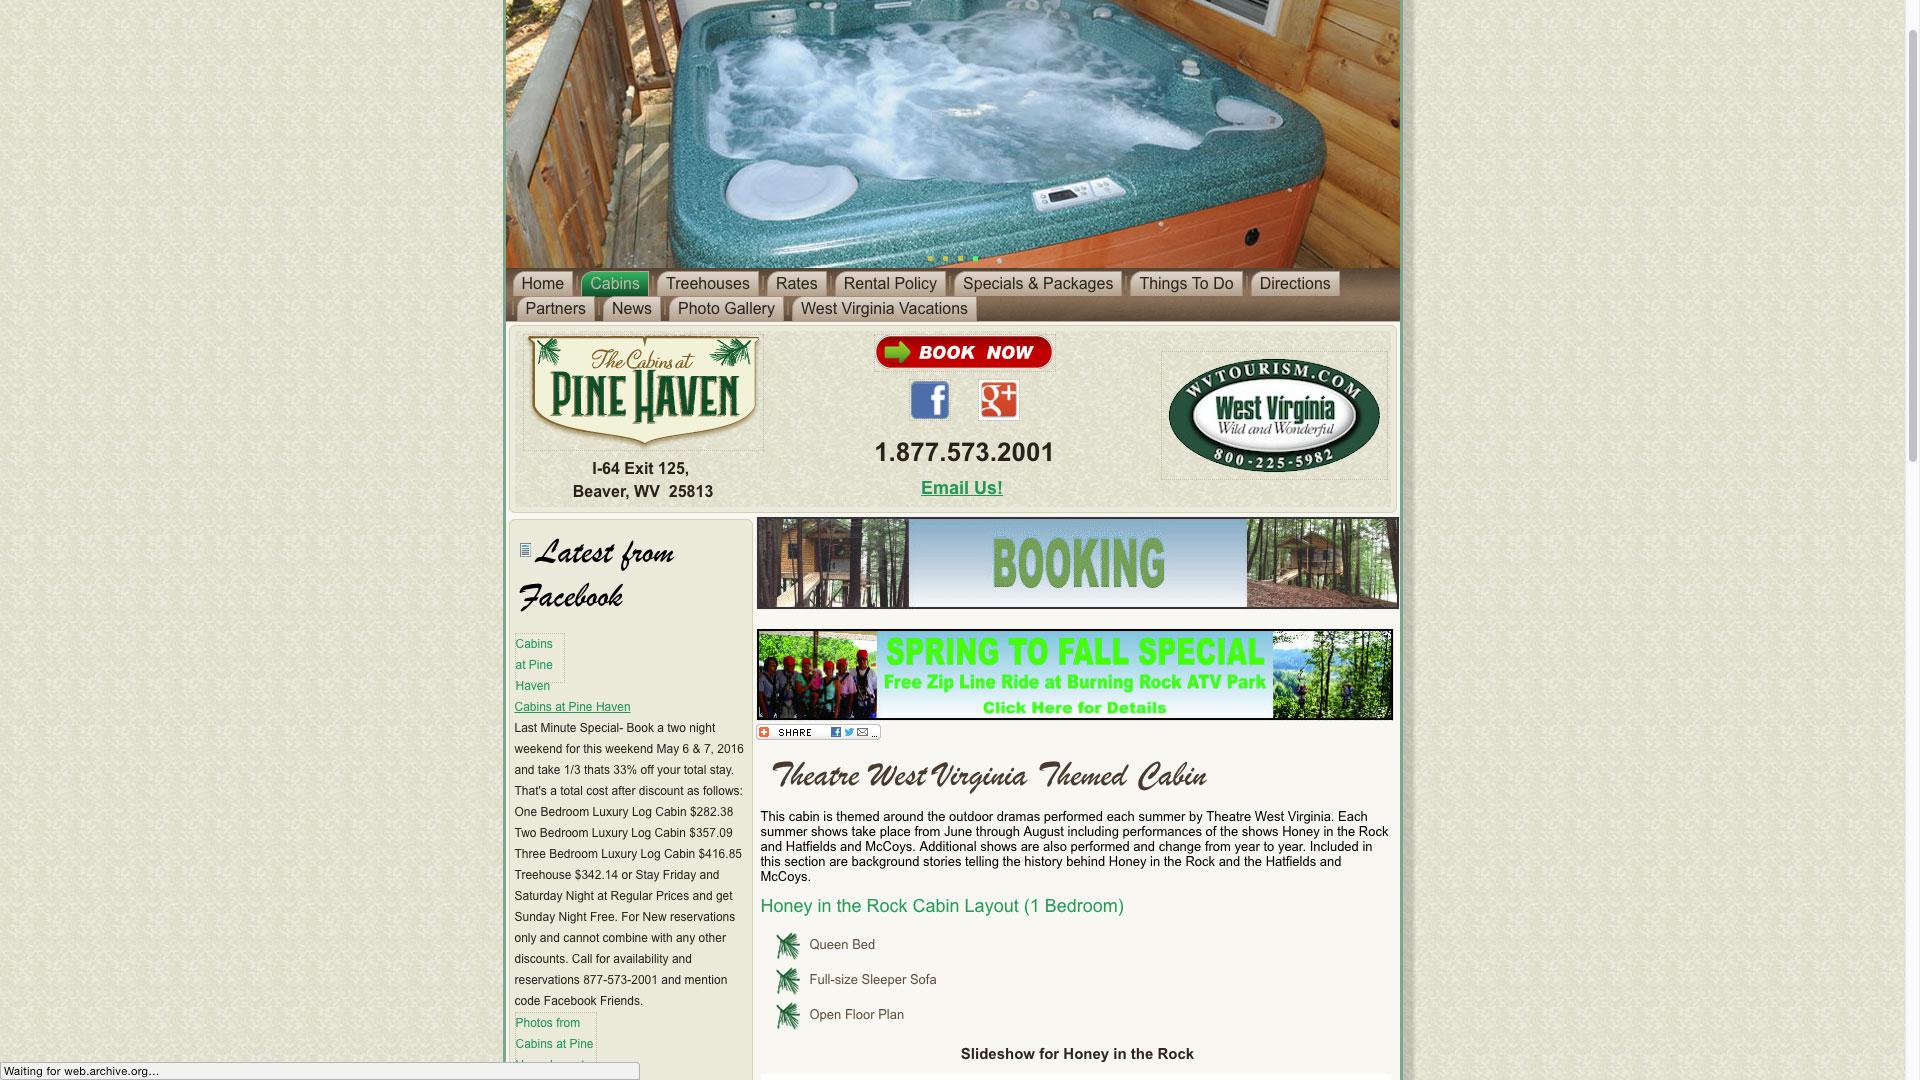 pinehaven-honey-rock-cabin-web-design